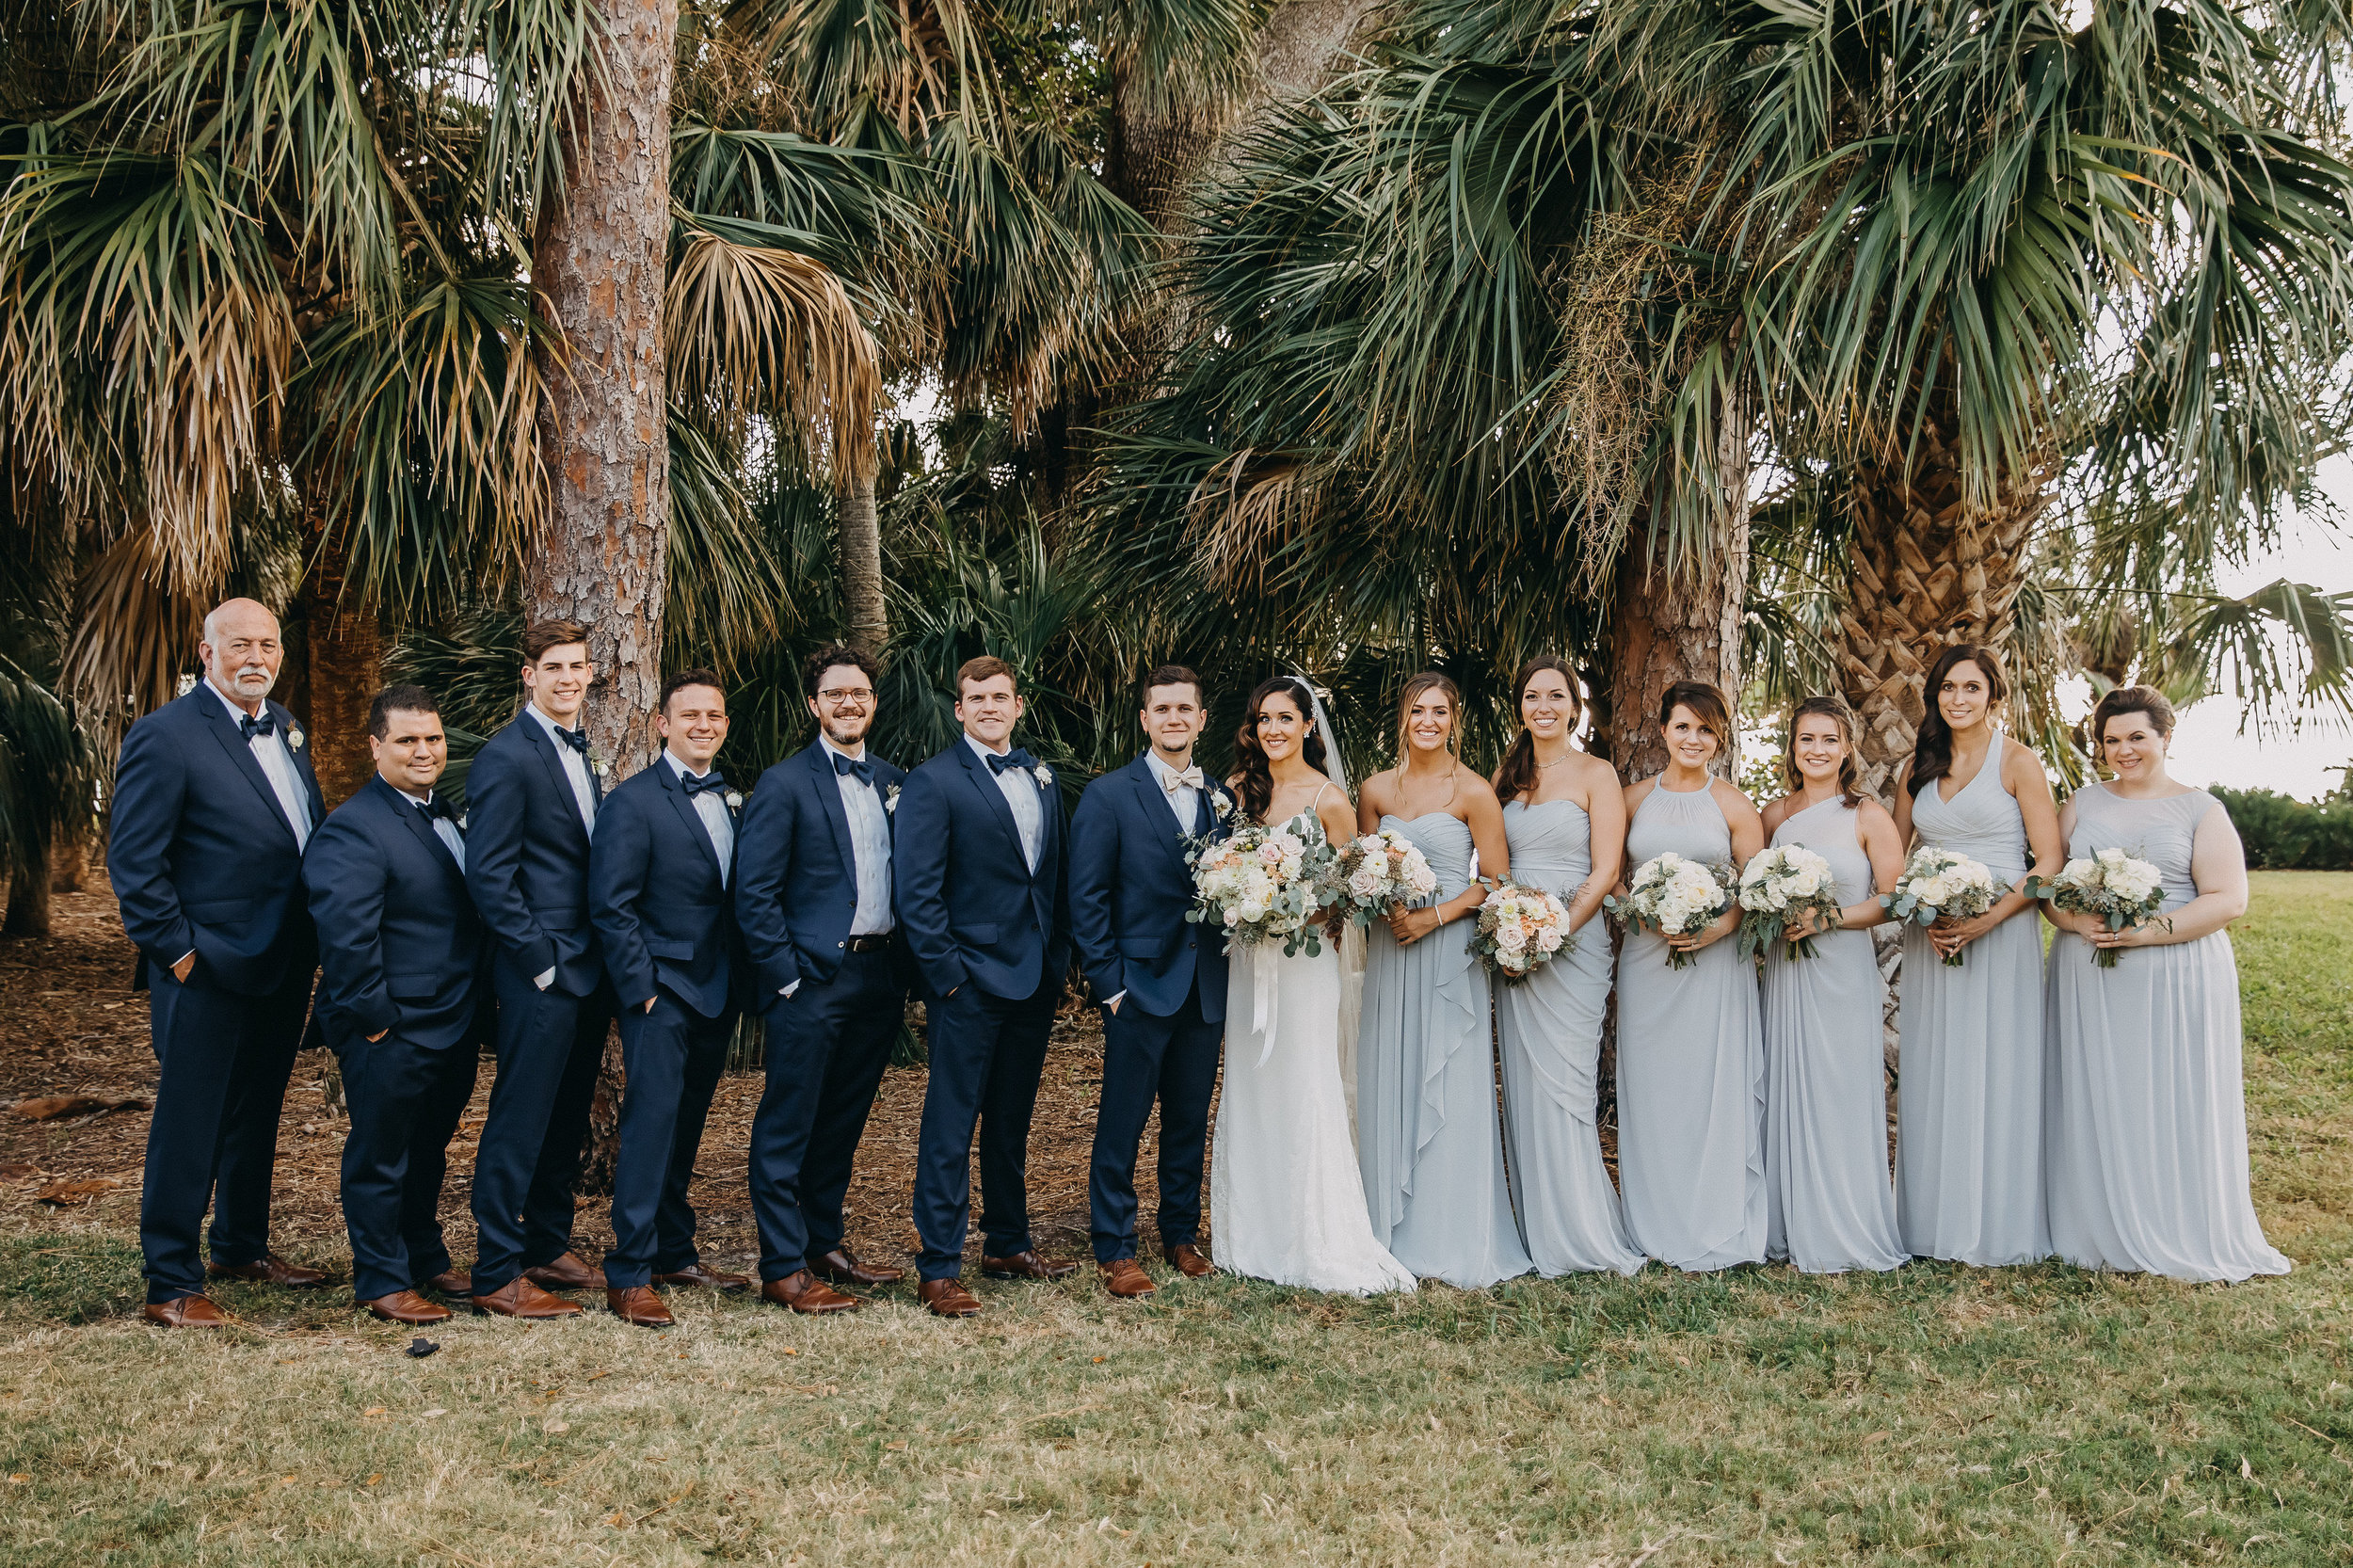 Grey Light Blue Bridesmaid Dresses - Florida Estate Wedding - Powel Crowley Estate Wedding